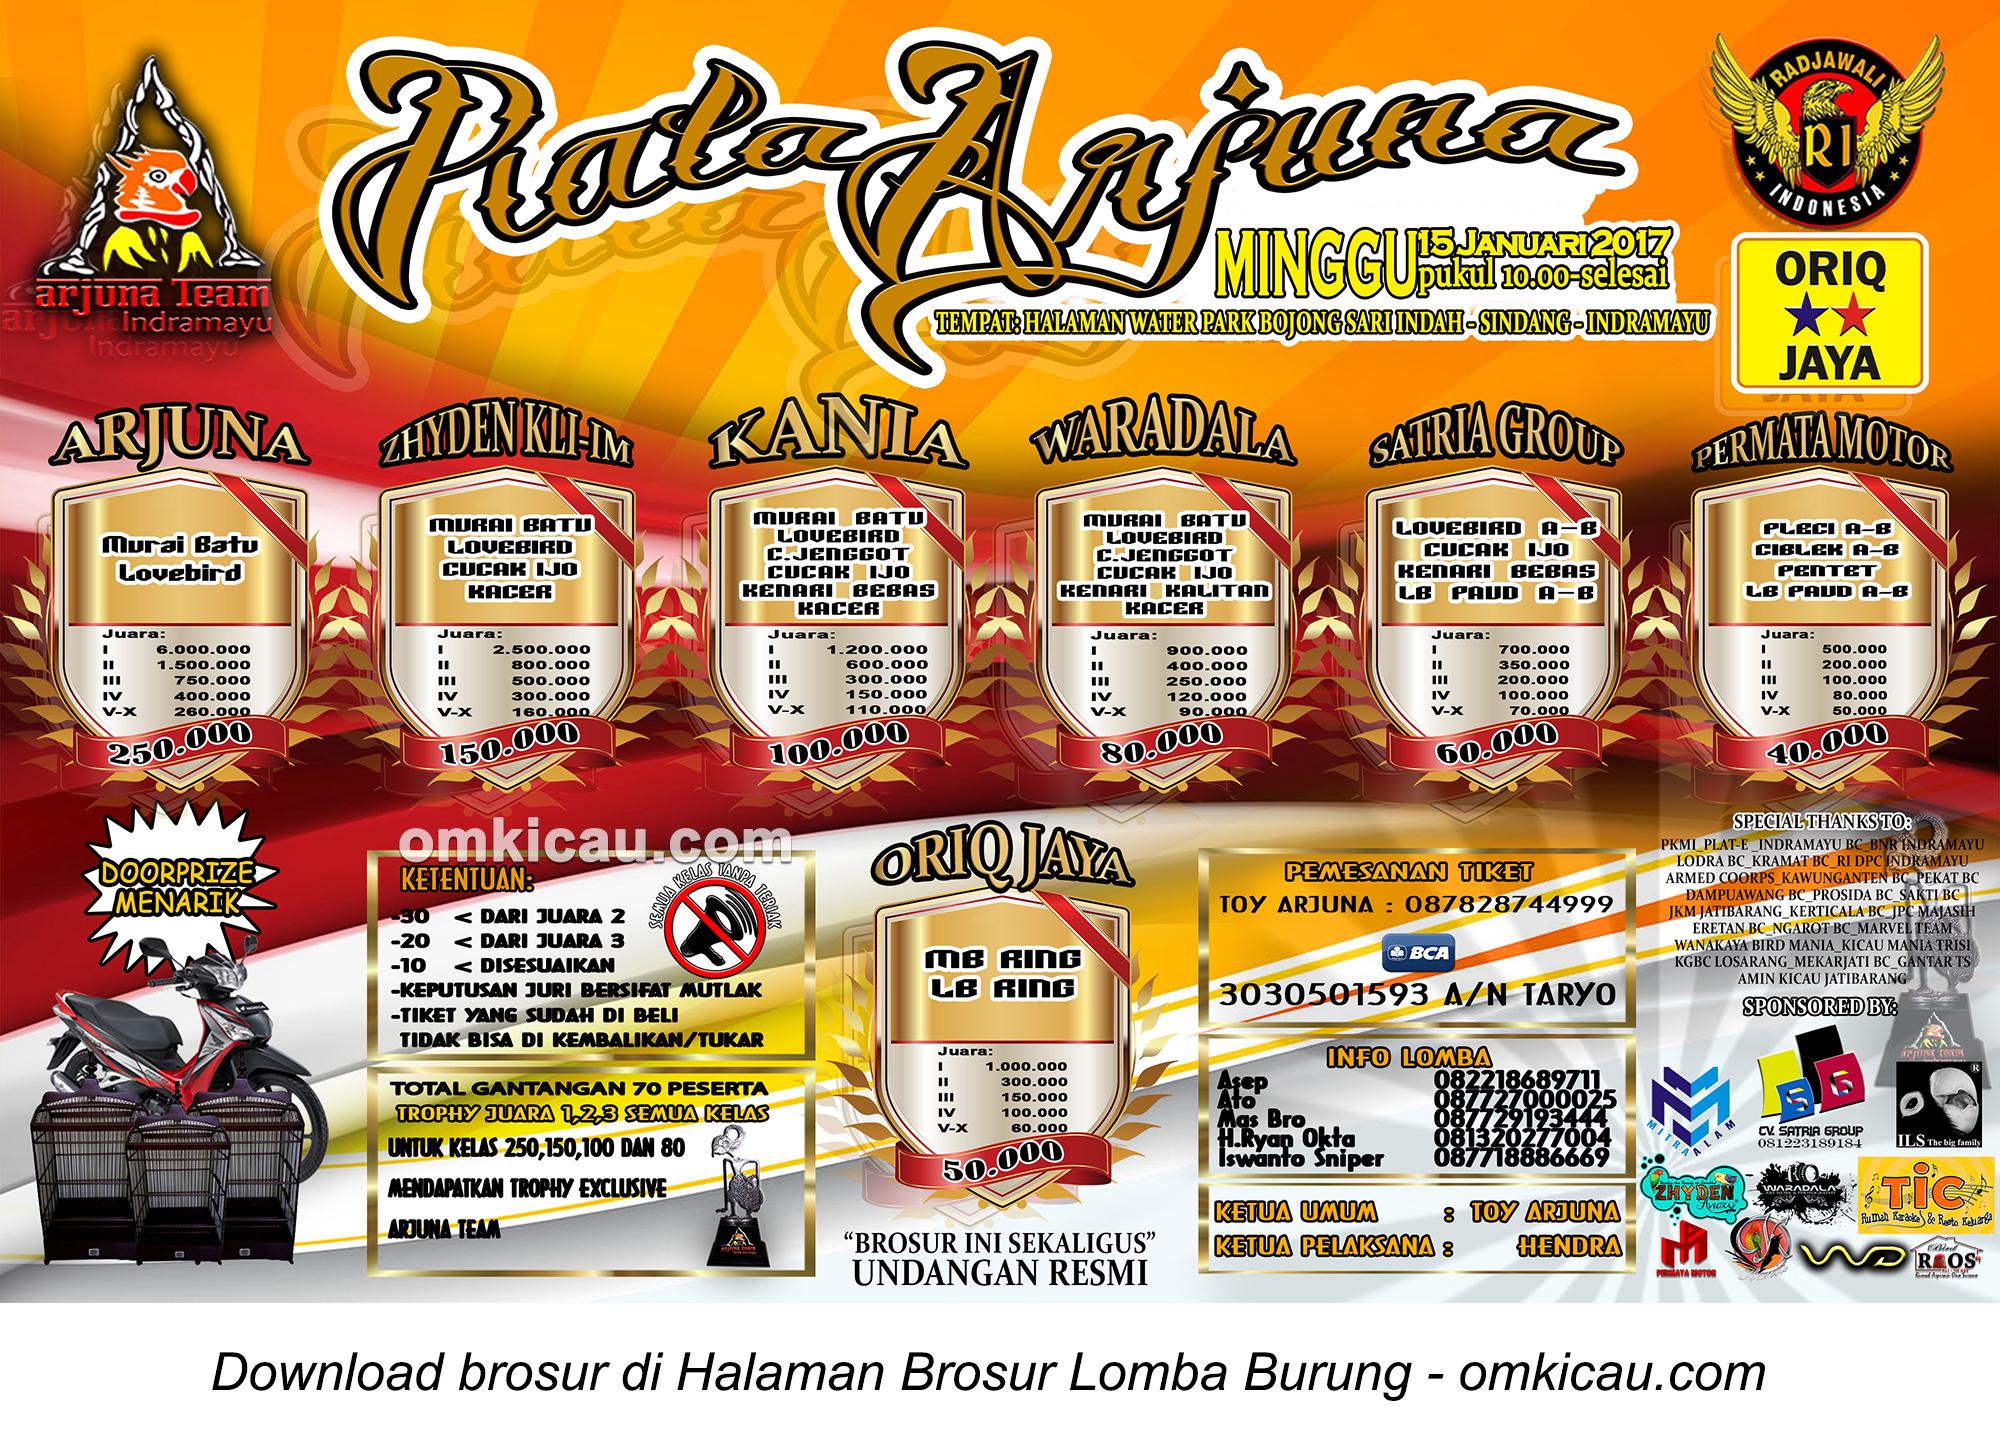 Brosur Lomba Burung Berkicau Piala Arjuna, Indramayu, 15 Januari 2017